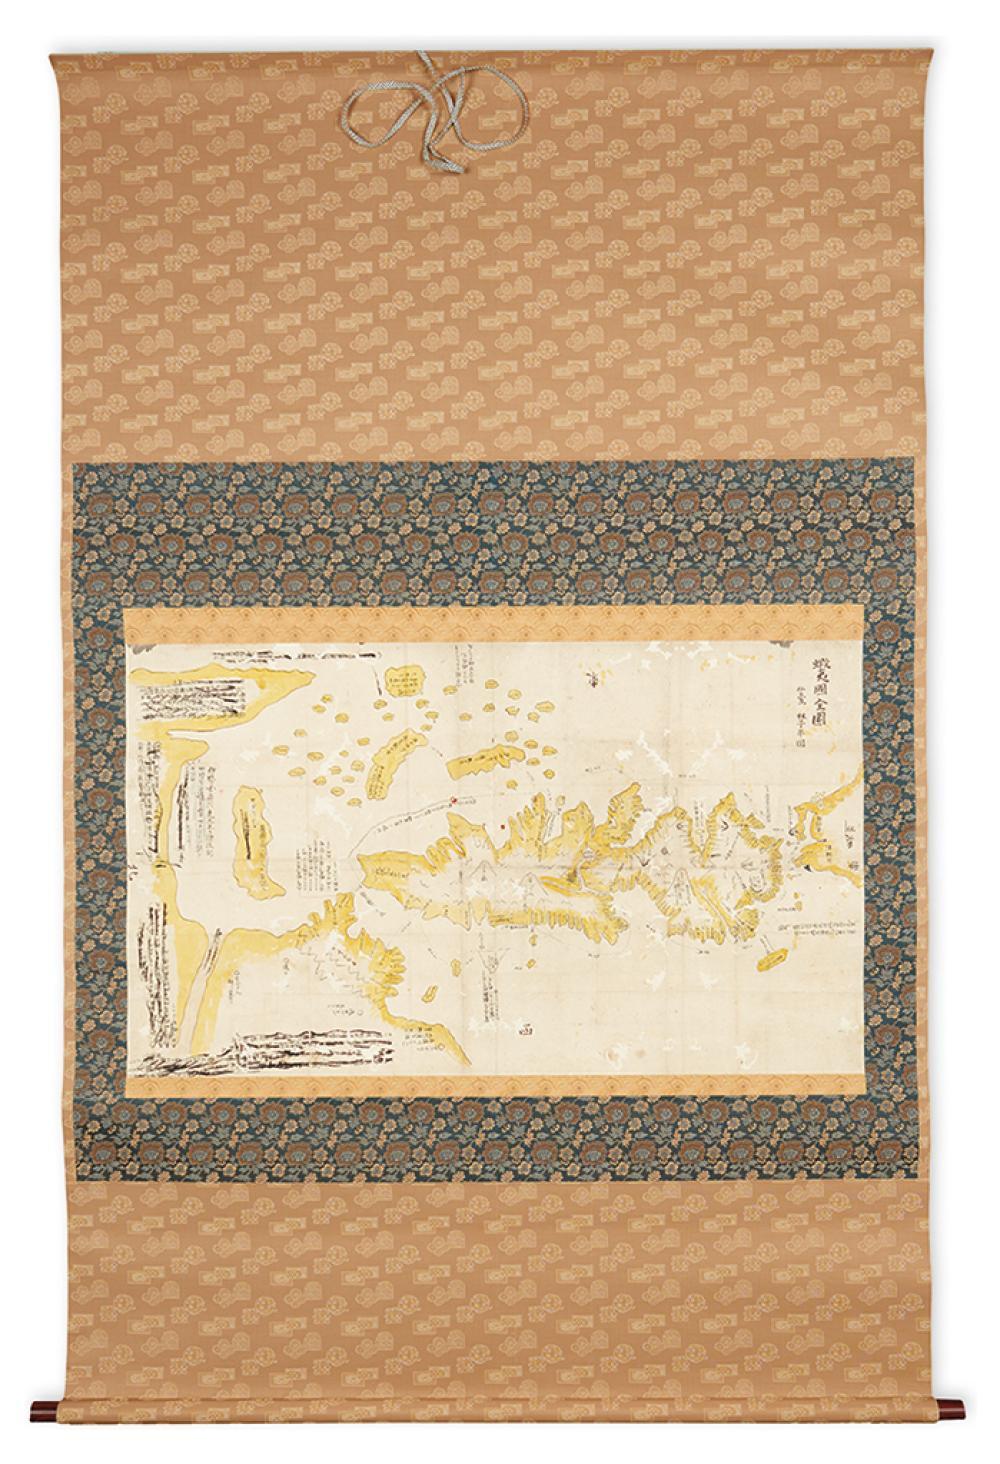 (JAPAN.) Hayashi Shihei. Ezo No Kuni Zenzu (Map of the Ezo Region).